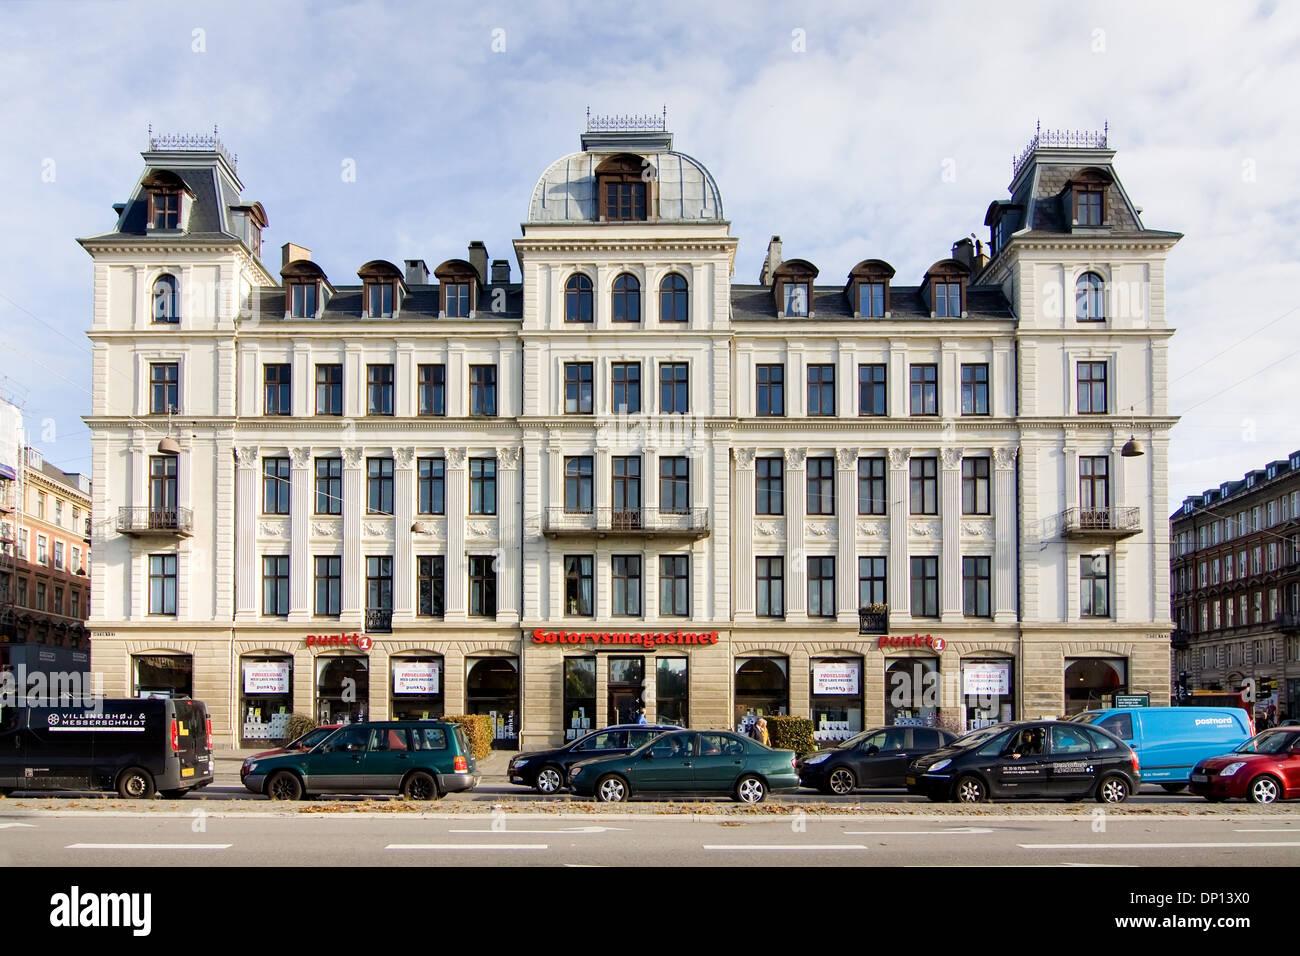 View along historic buildings of Havnegade Copenhagen, Denmark, Architecture - Stock Image